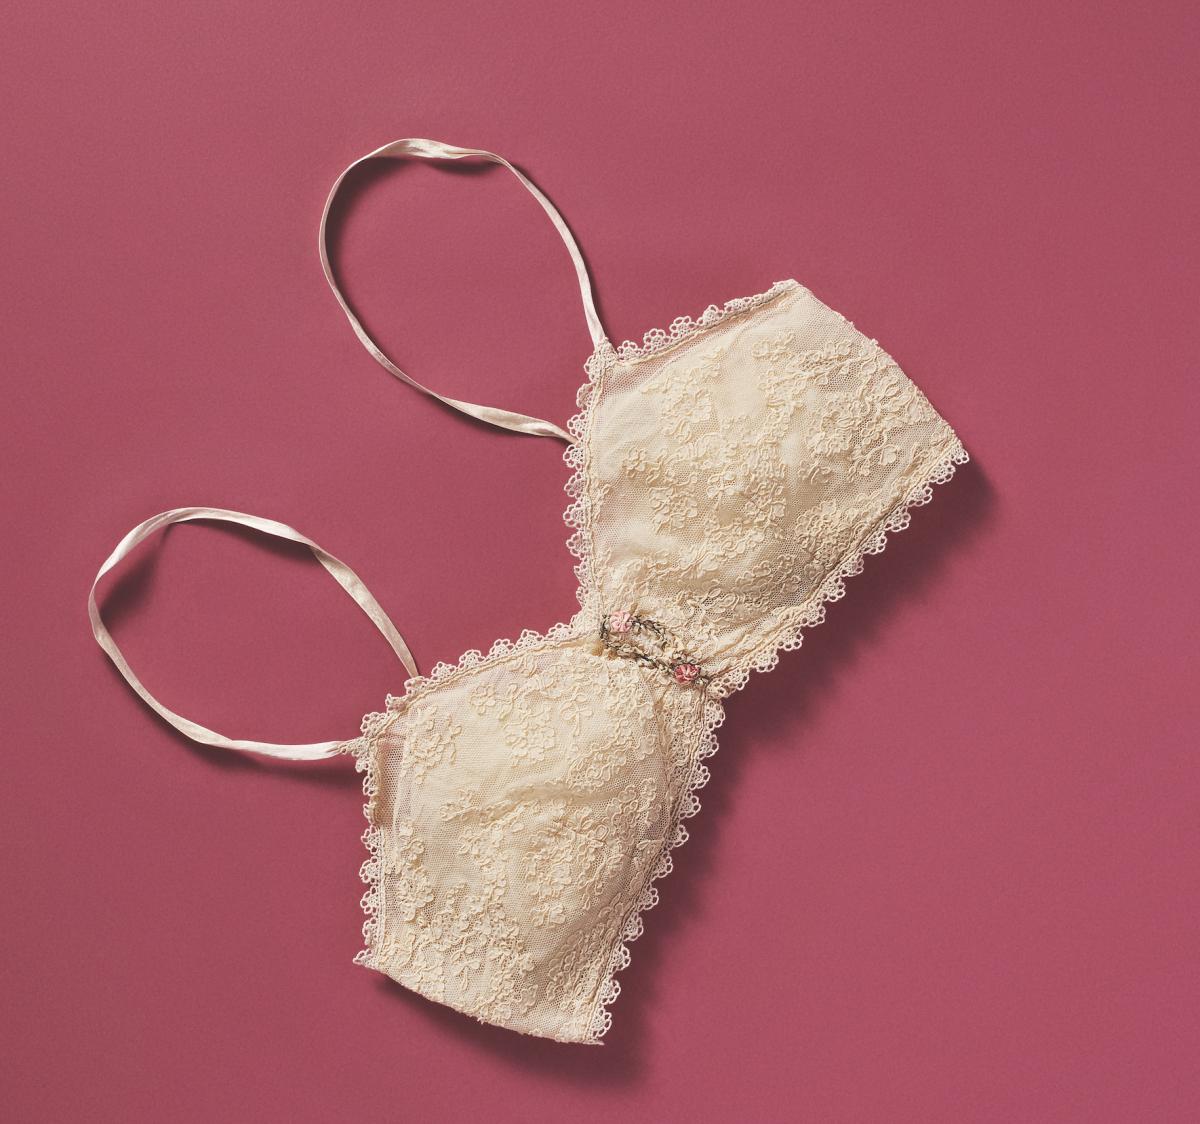 A bra.